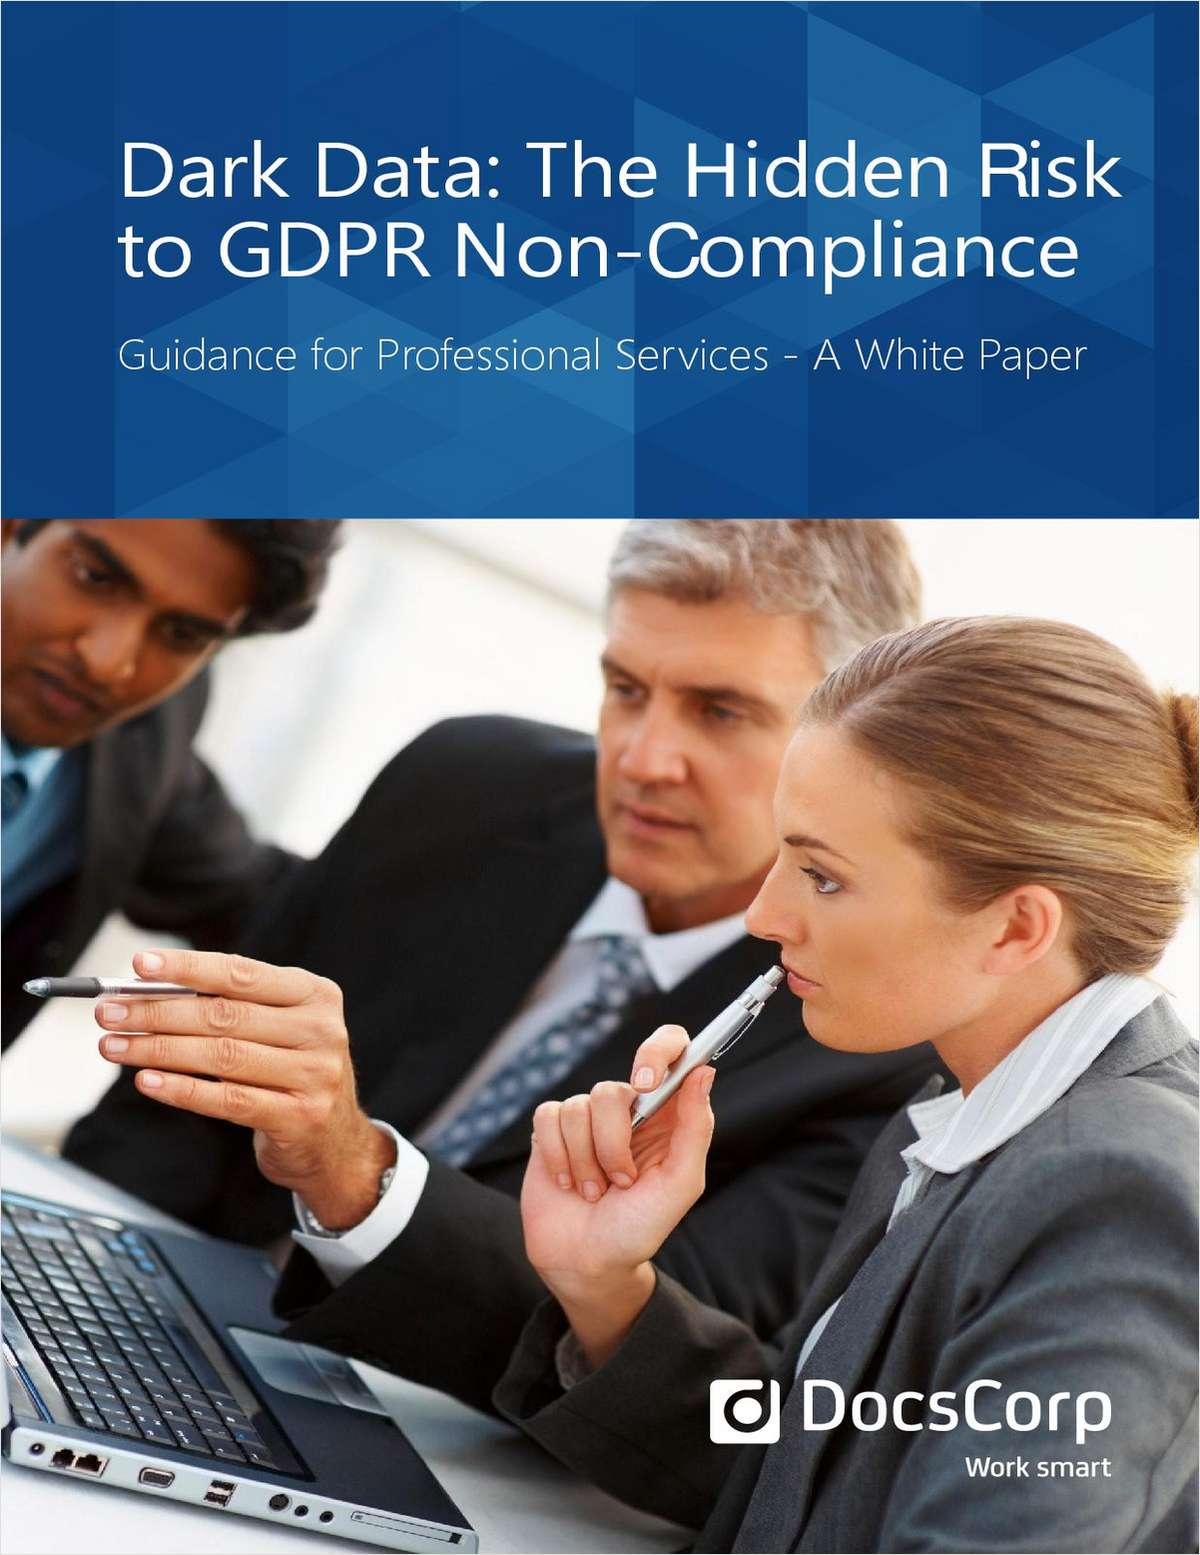 Dark Data: The Hidden Risk to GDPR Non-Compliance